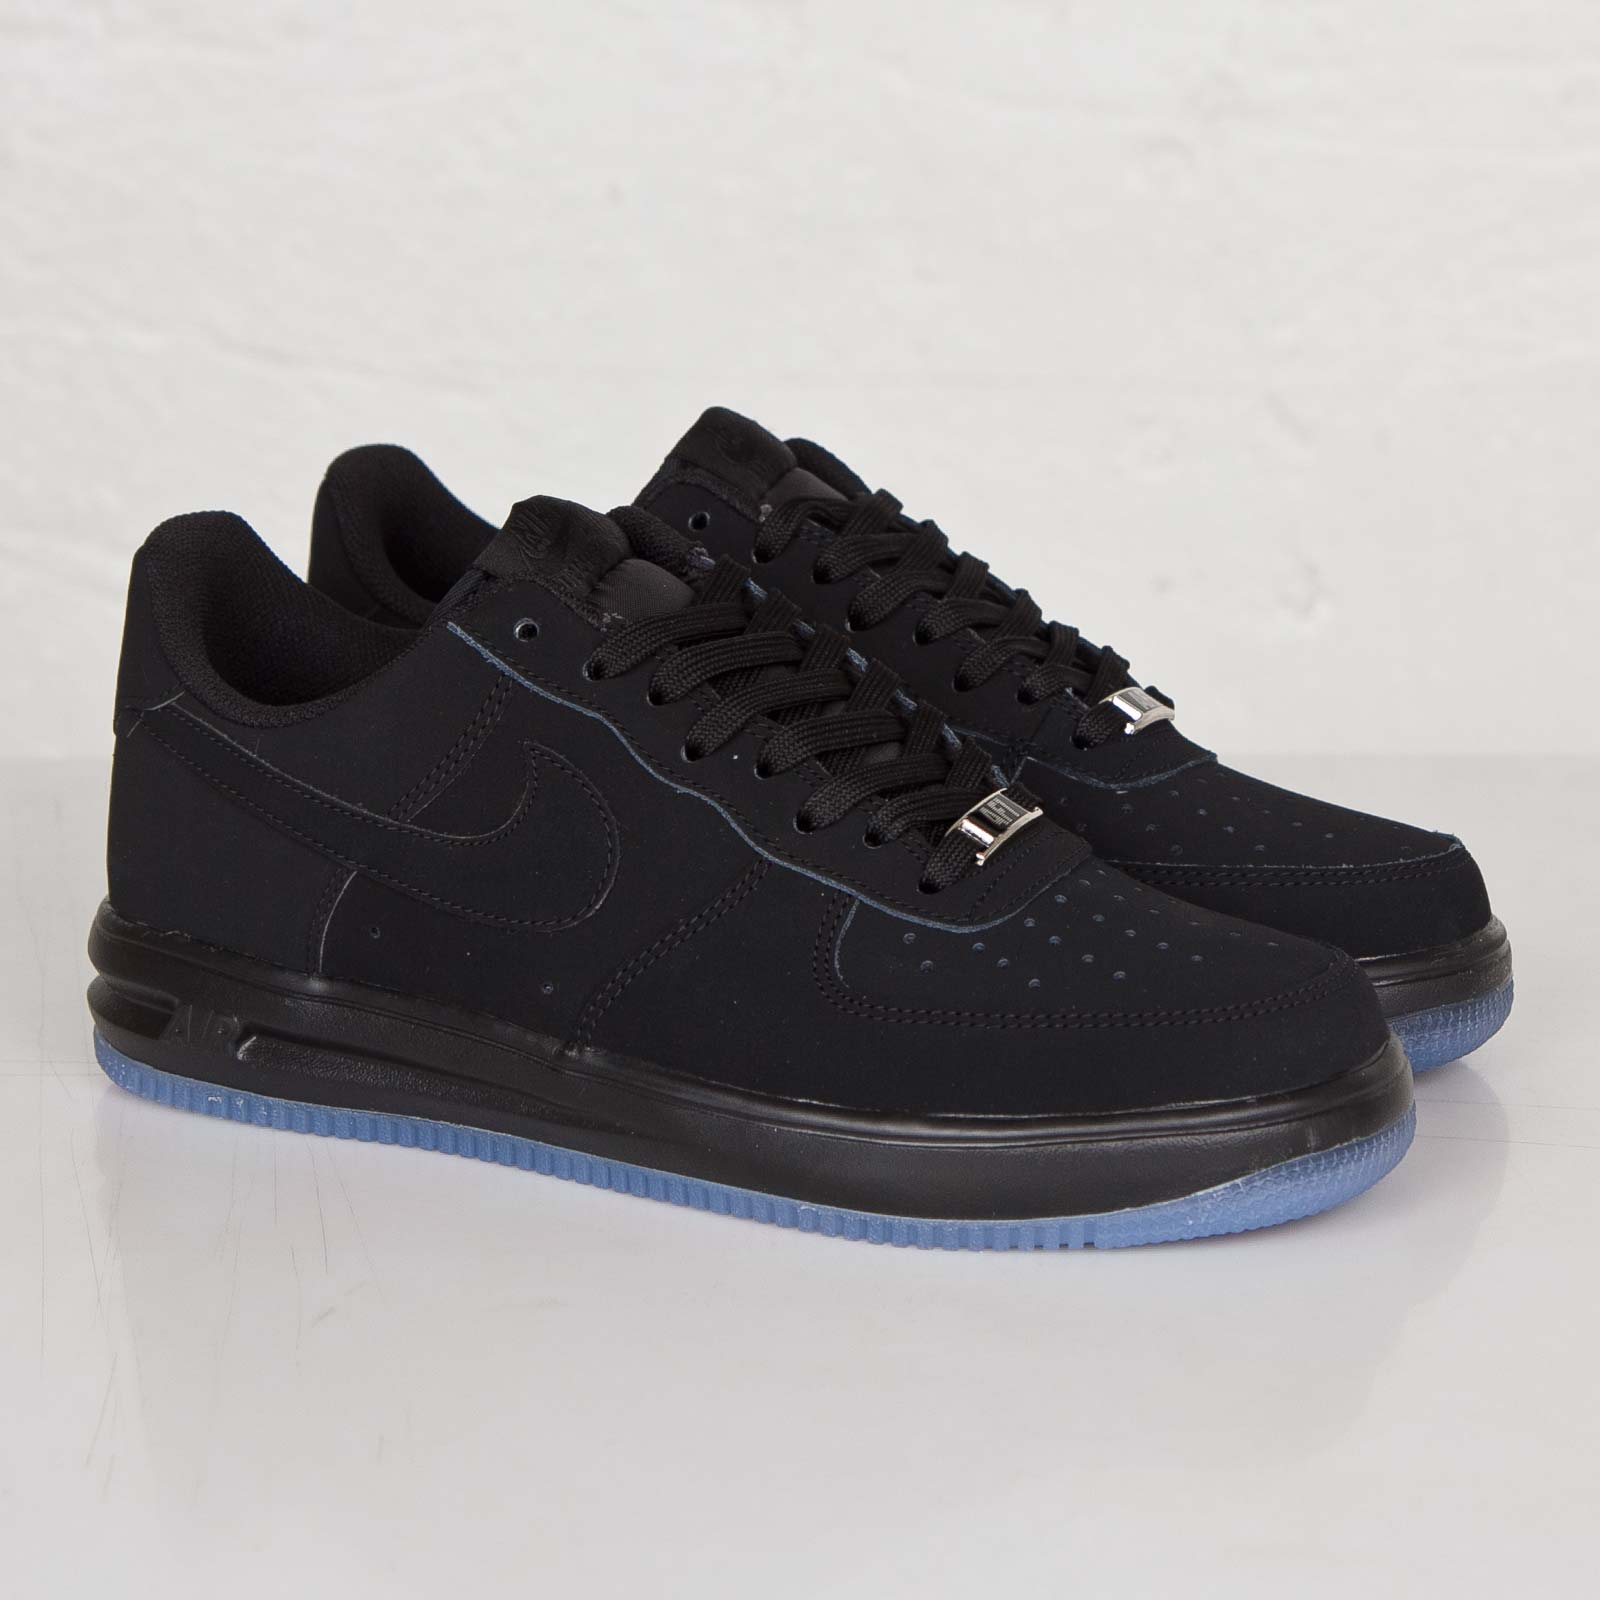 sports shoes 31228 1b88a ... aliexpress nike lunar force 1 14 8c021 1c8f1